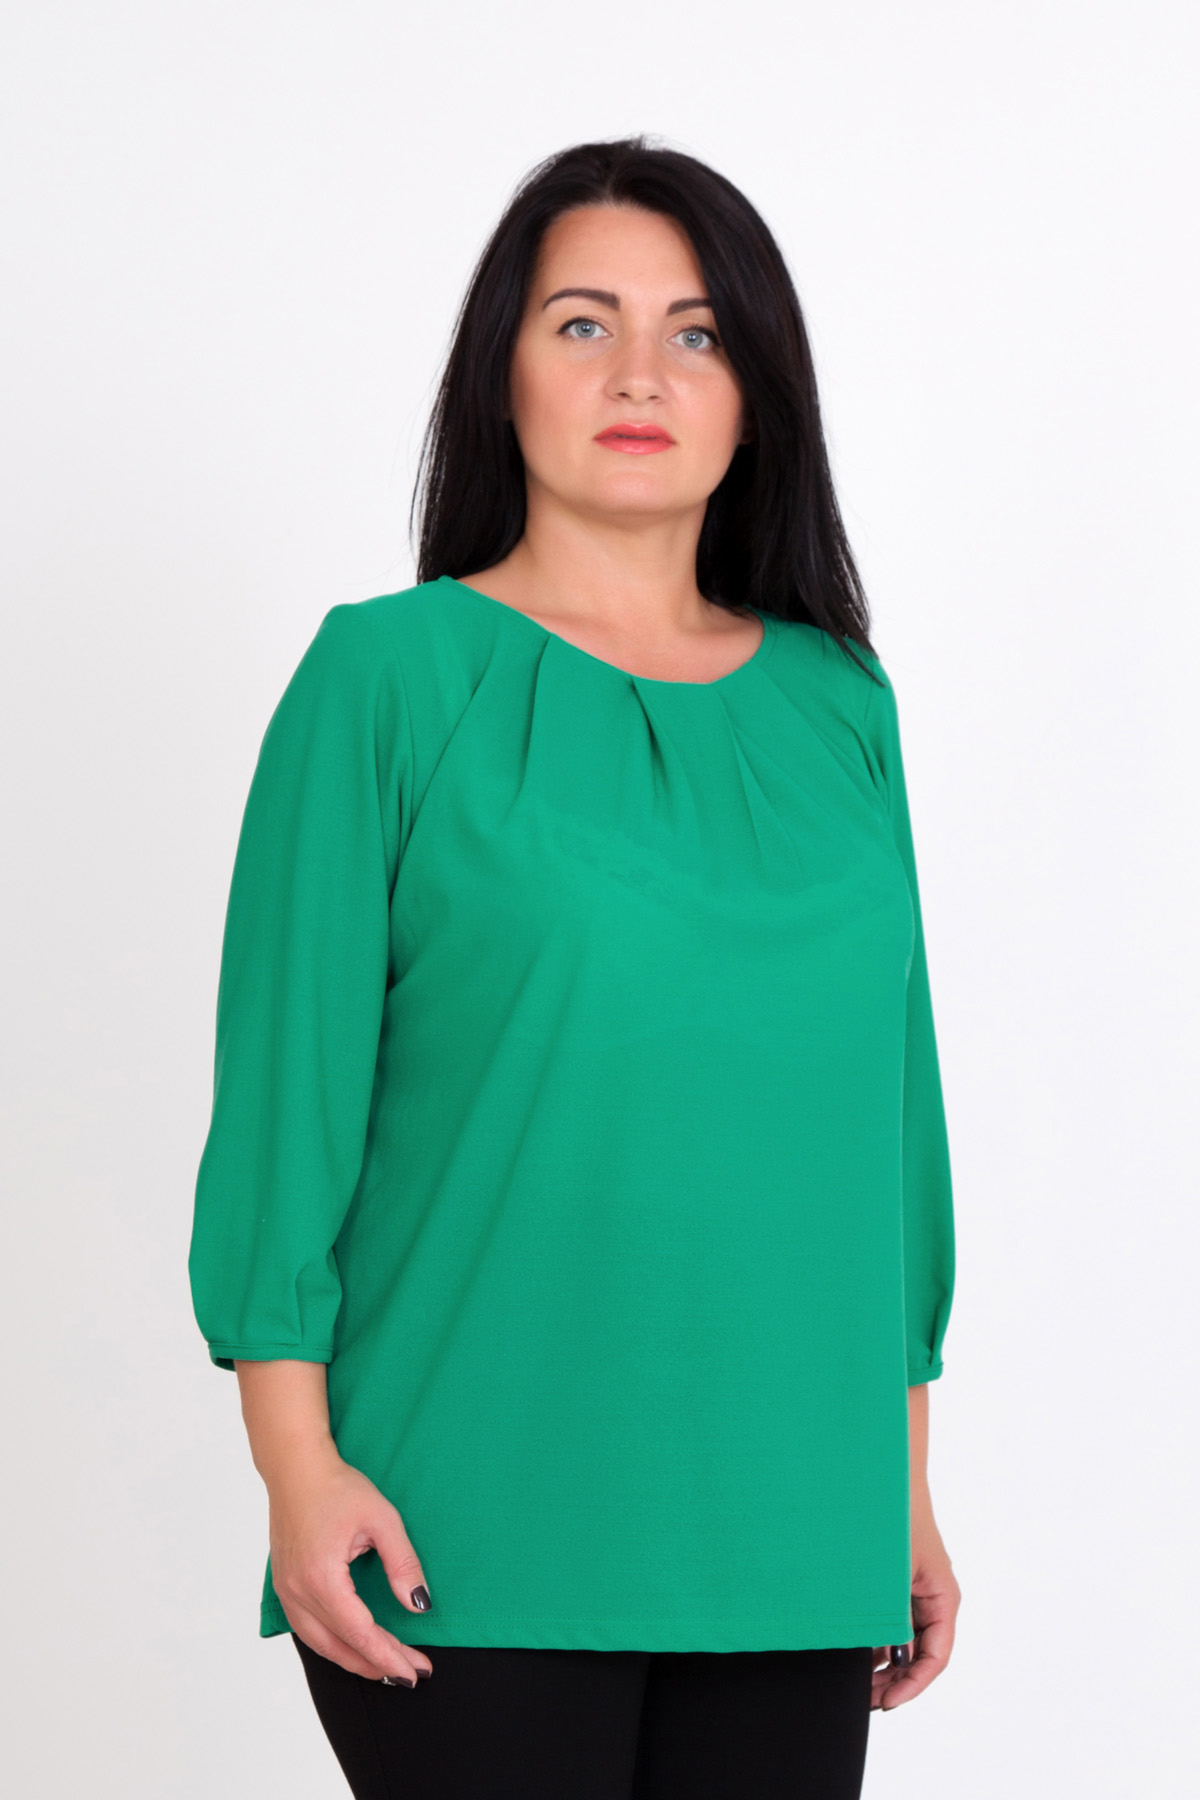 Жен. блуза Лайма р. 50Блузы<br>Обхват груди: 100 см <br>Обхват талии: 82 см <br>Обхват бедер: 108 см <br>Длина по спинке: 62 см <br>Рост: 167 см<br><br>Тип: Жен. блуза<br>Размер: 50<br>Материал: Креп